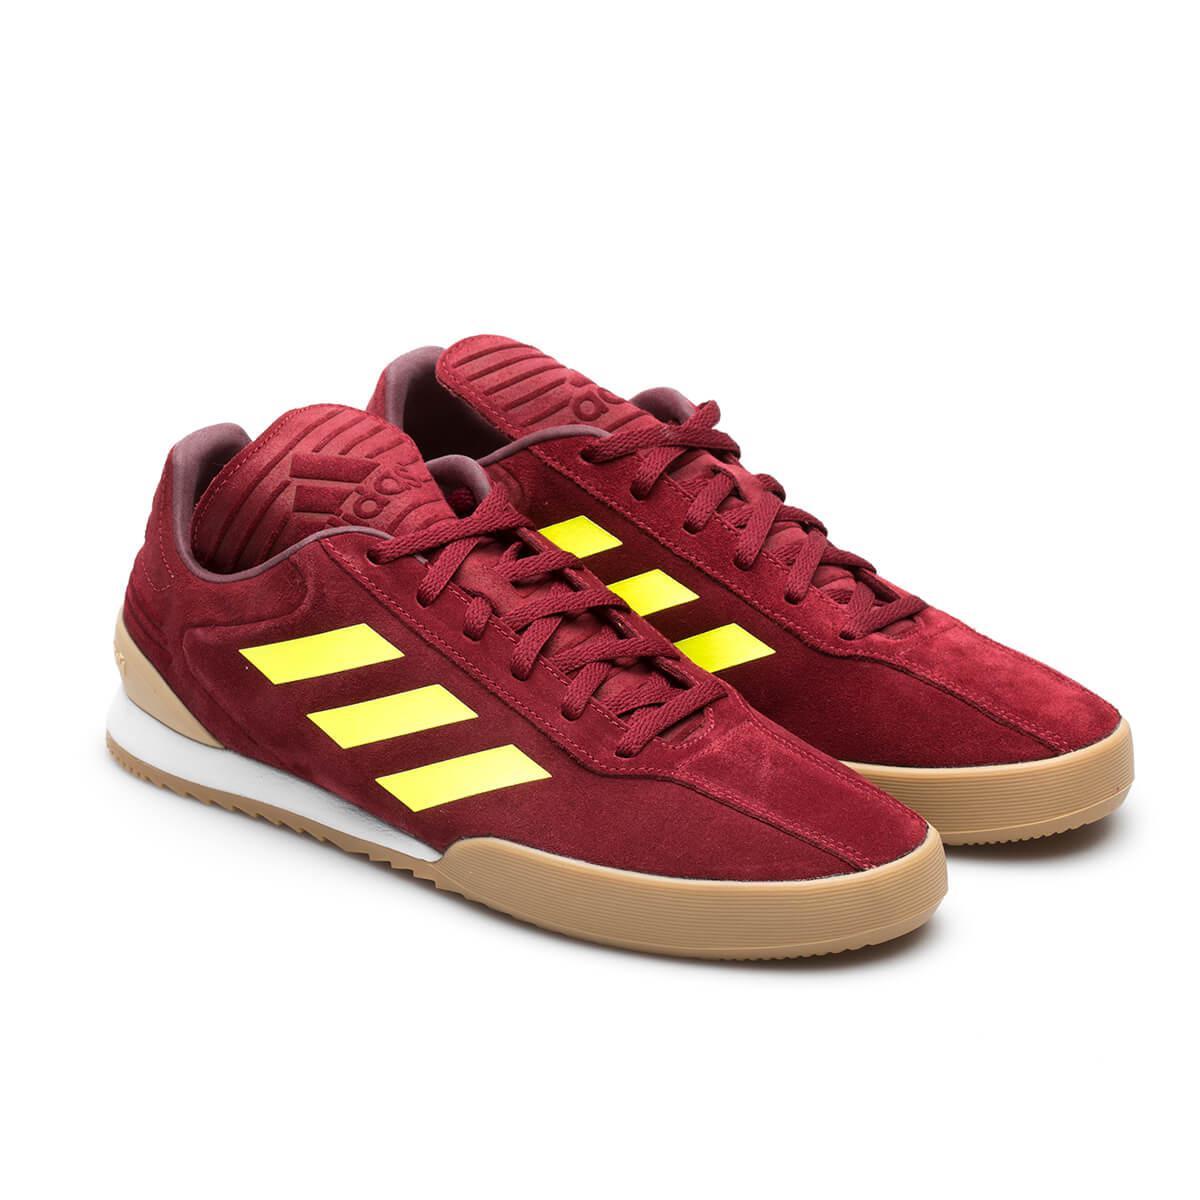 quality design e3ca4 81ac6 Gosha Rubchinskiy - Red Copa Super Adidas for Men - Lyst. View fullscreen